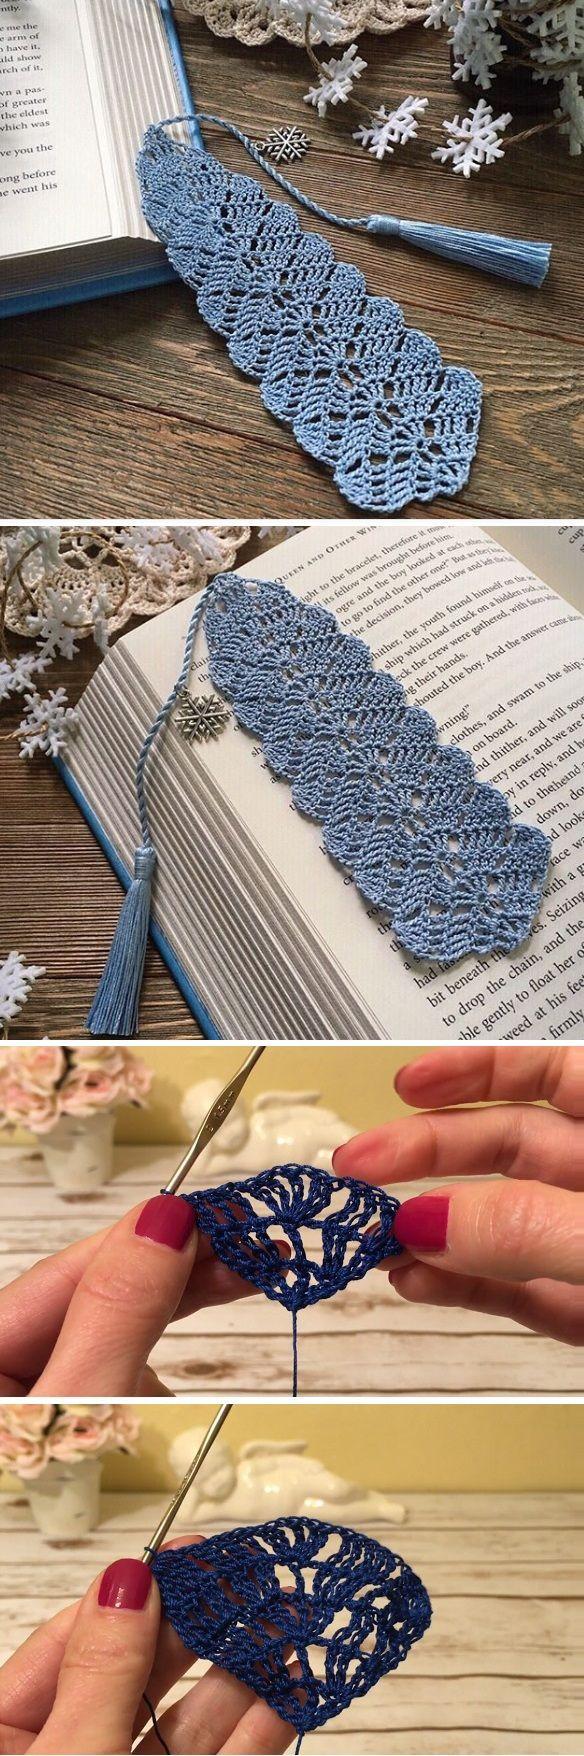 Crochet Bookmark Crochet Bookmarks Crochet Patterns Crochet Basics